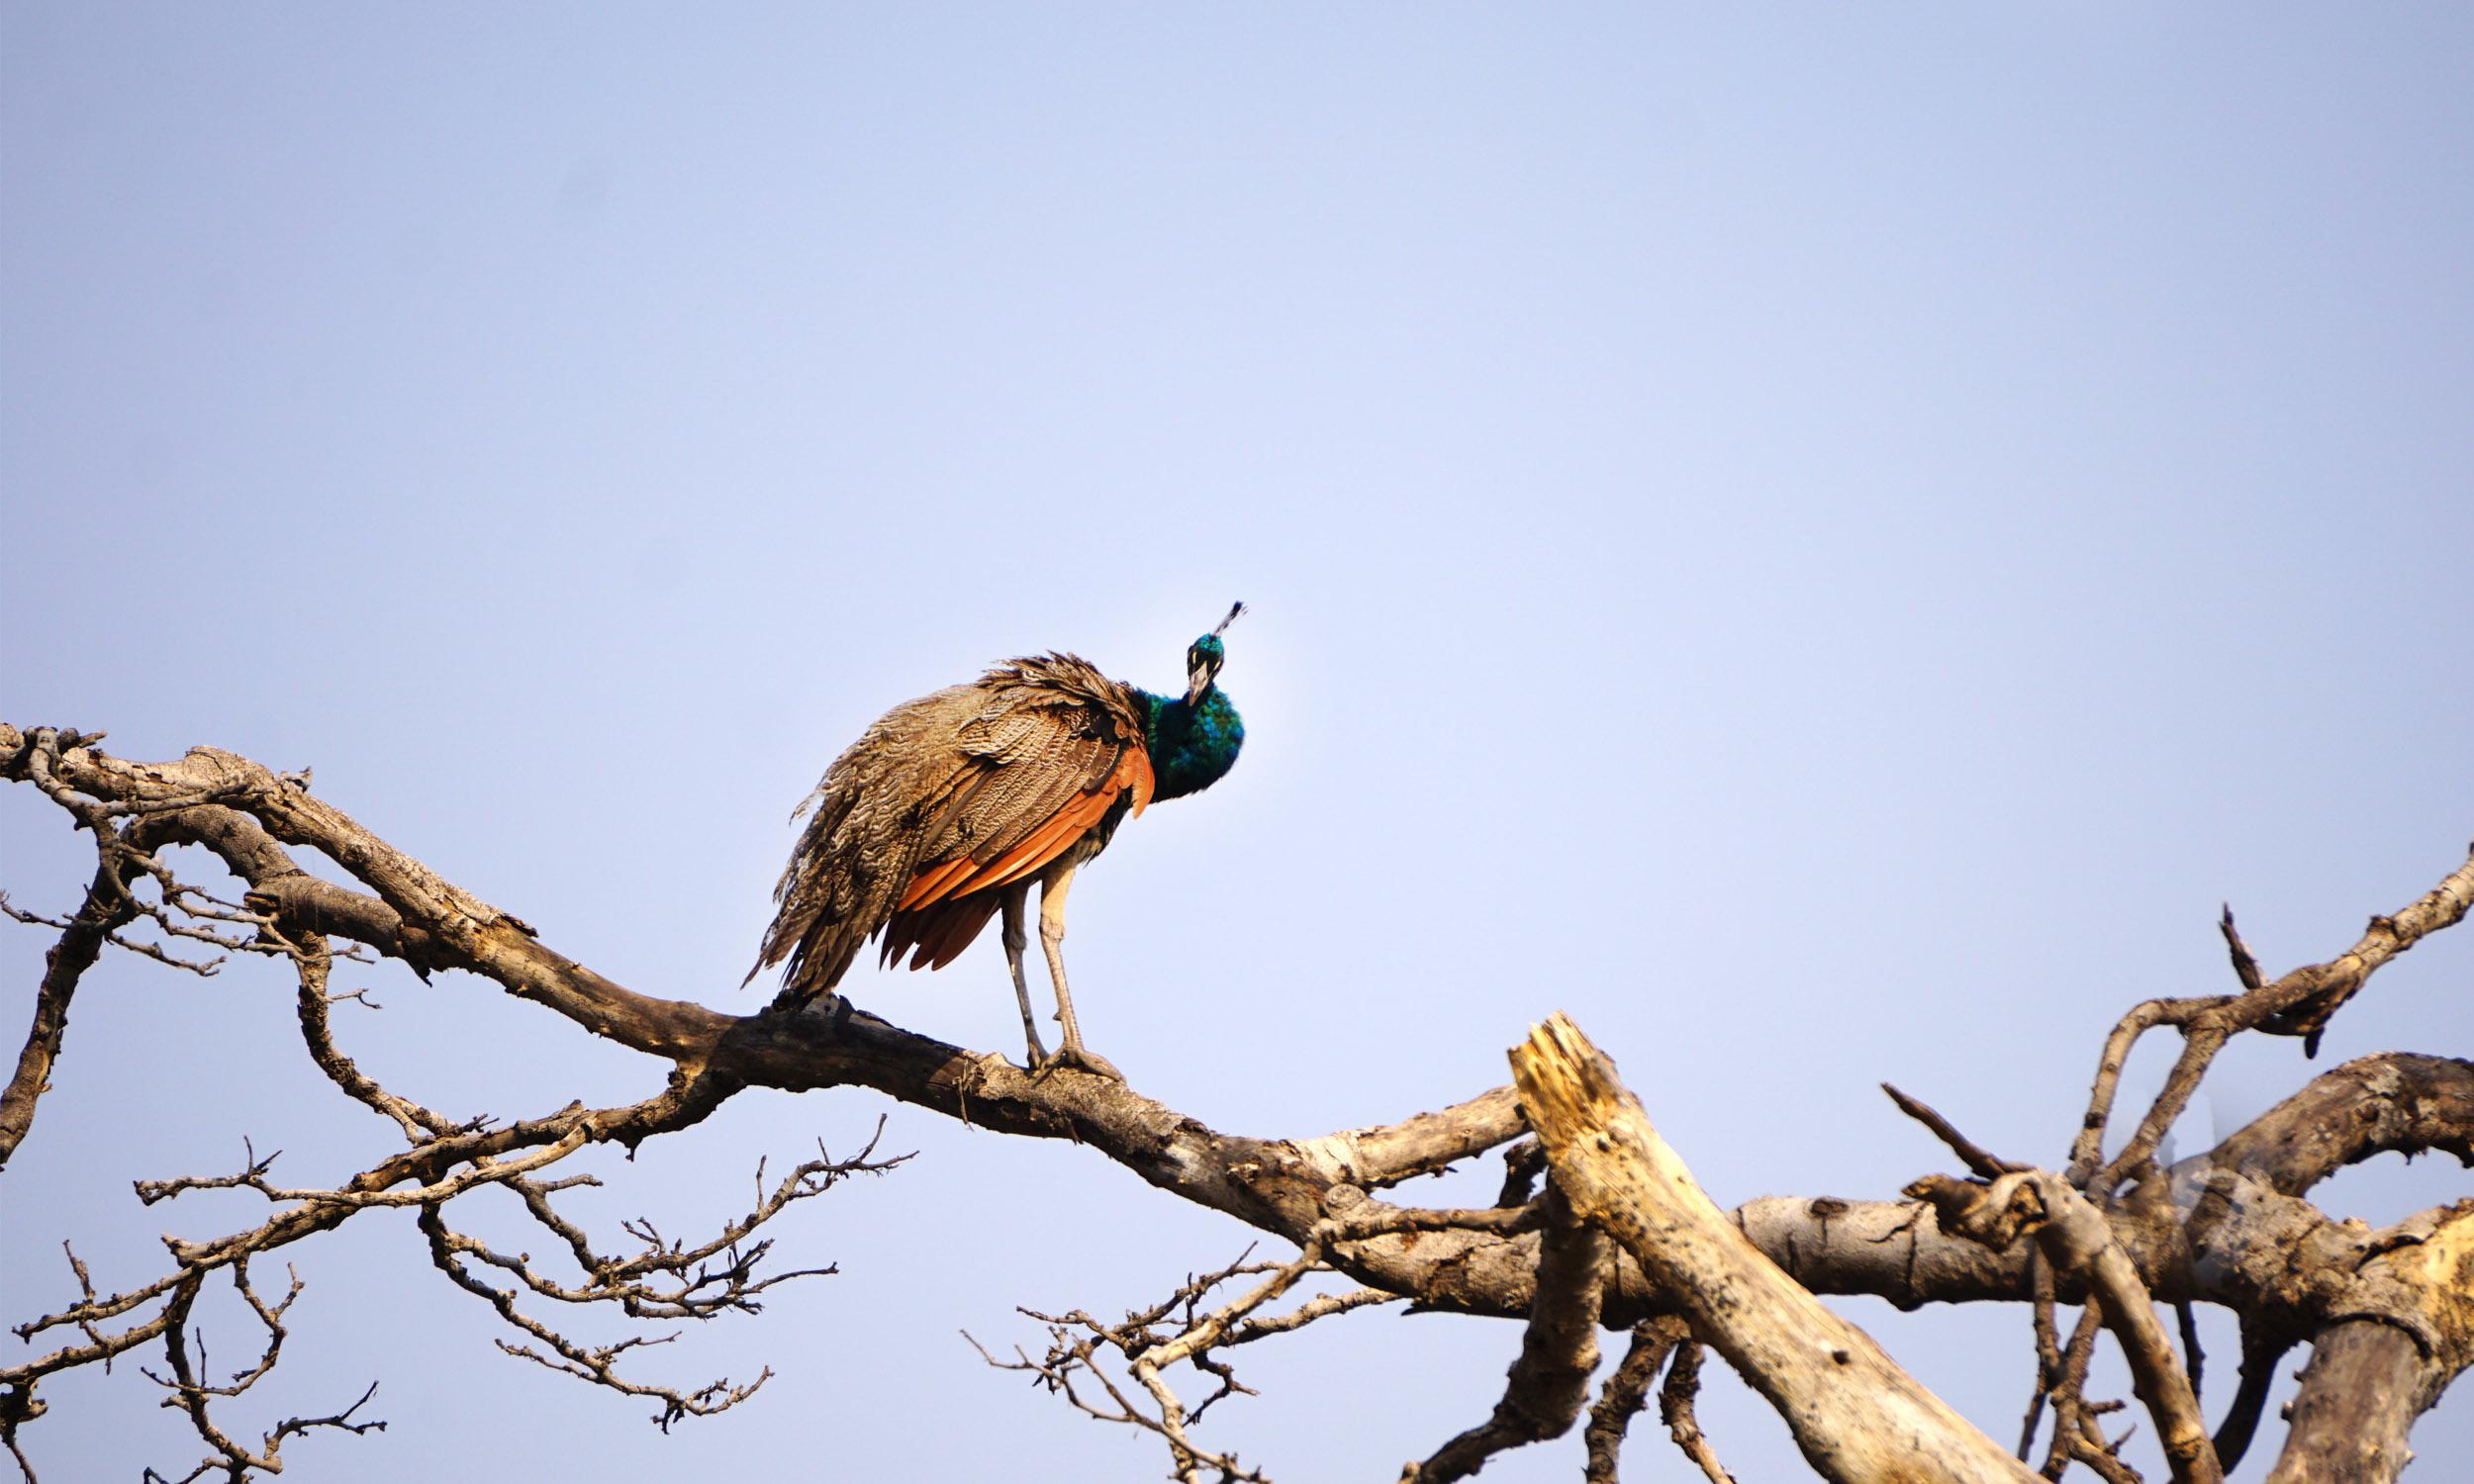 peacock_india.jpg